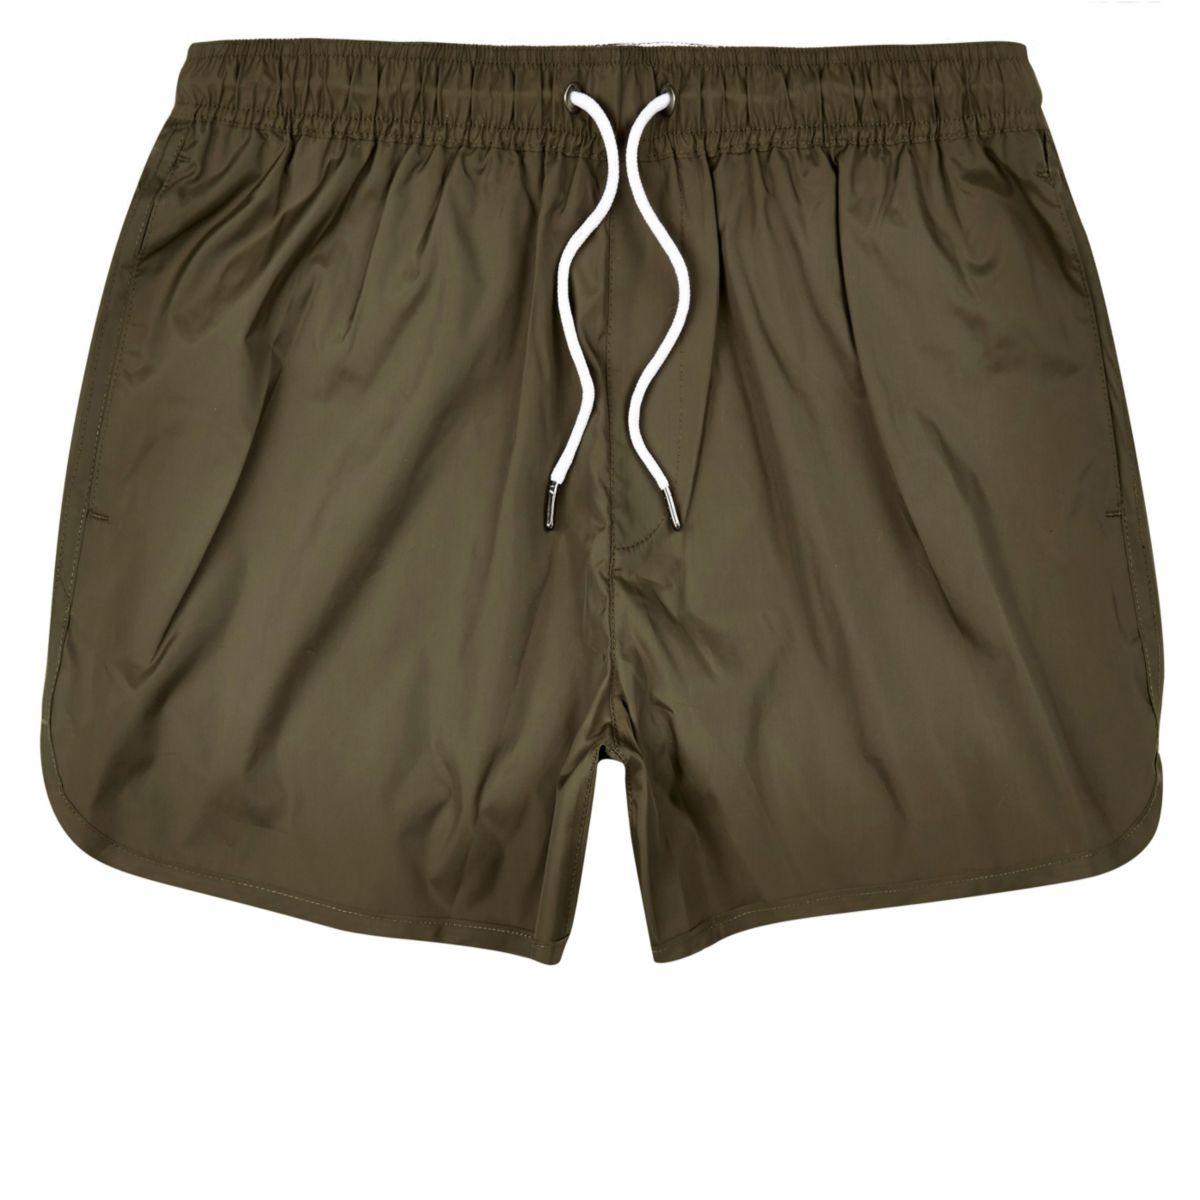 Khaki green plain swim shorts